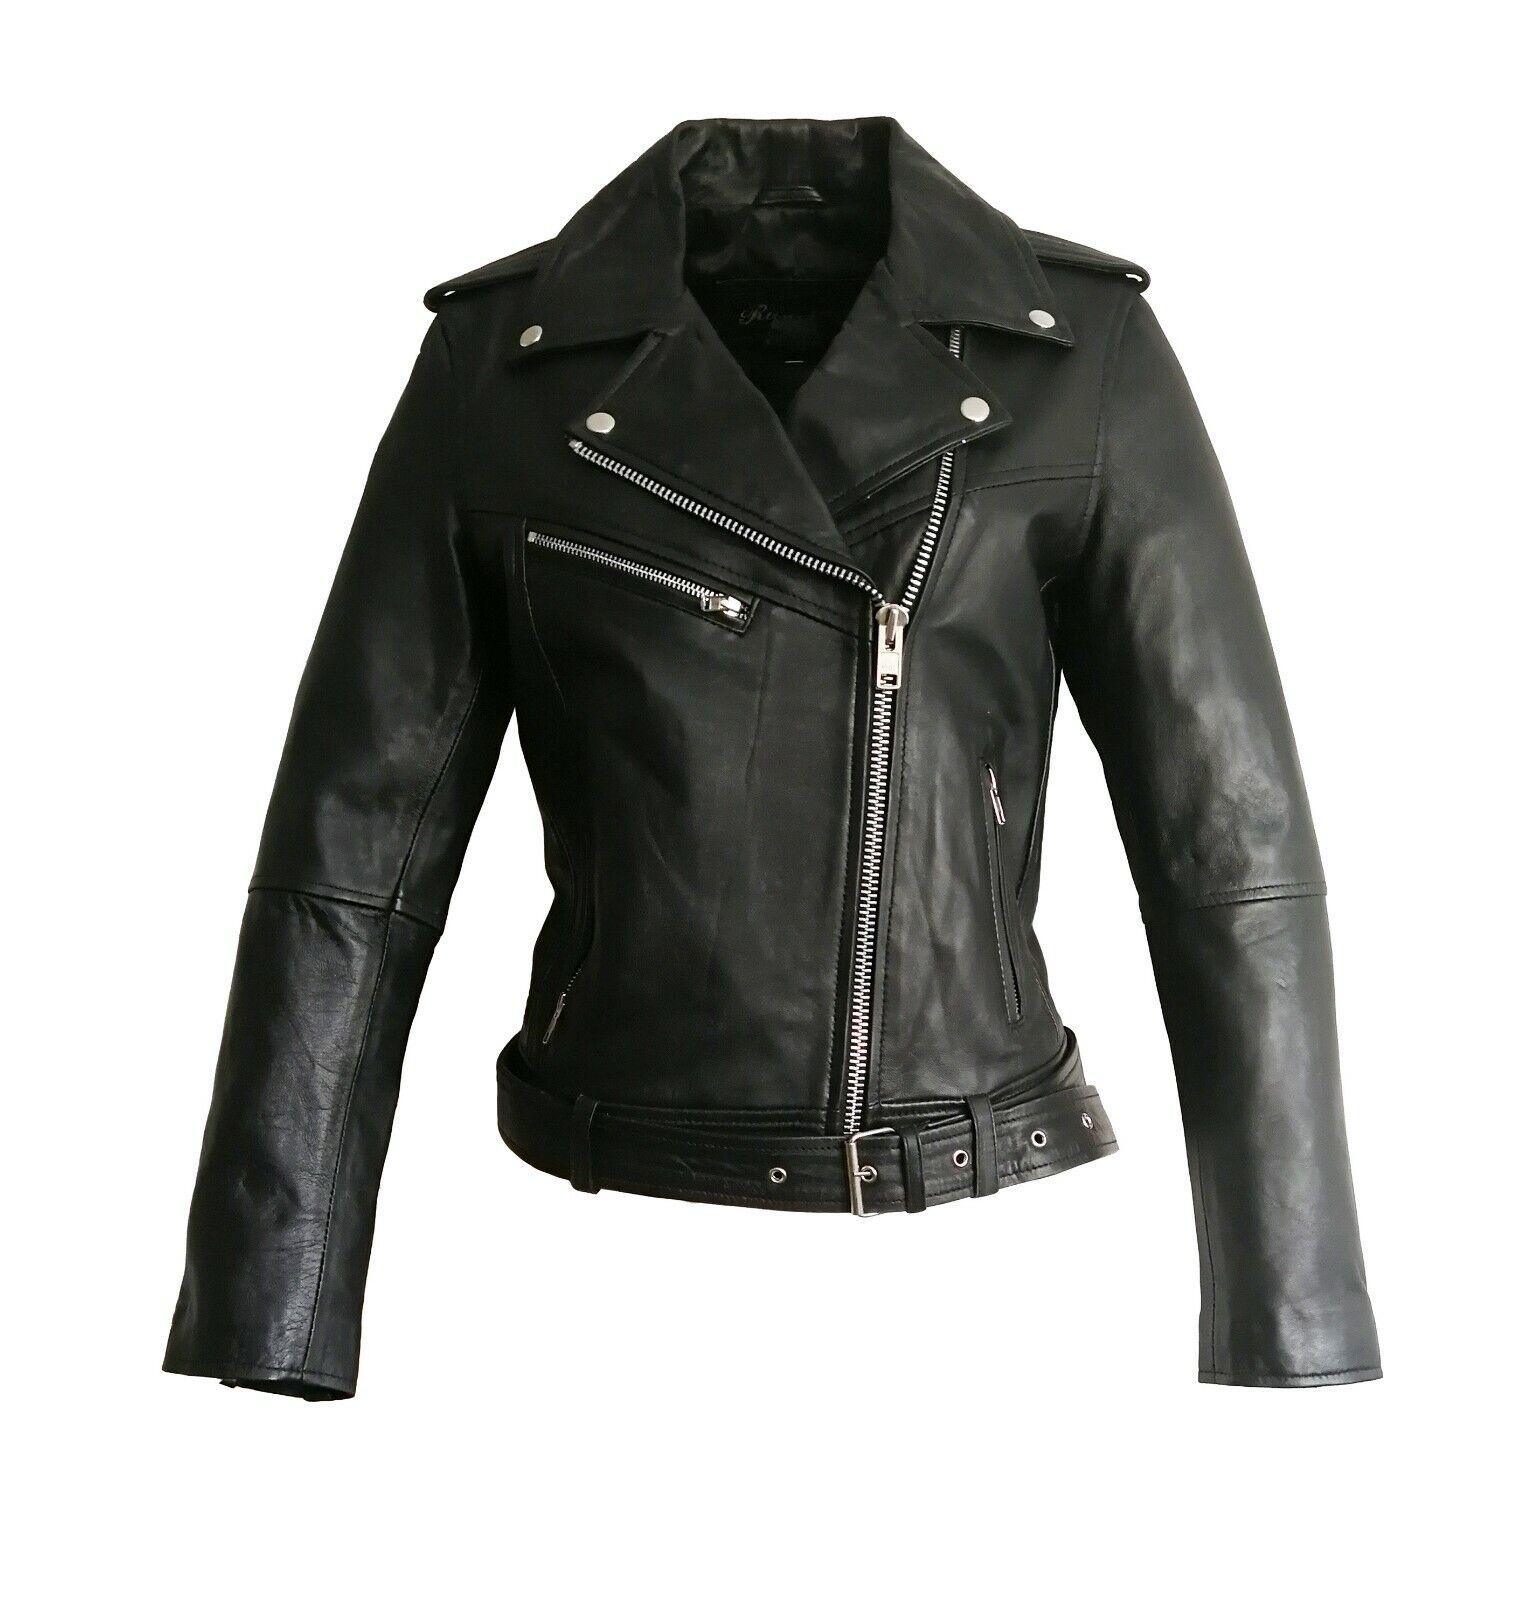 Damen Bikerjacke Lederjacke Brando Girl RB schwarz aus Lammnappa Leder